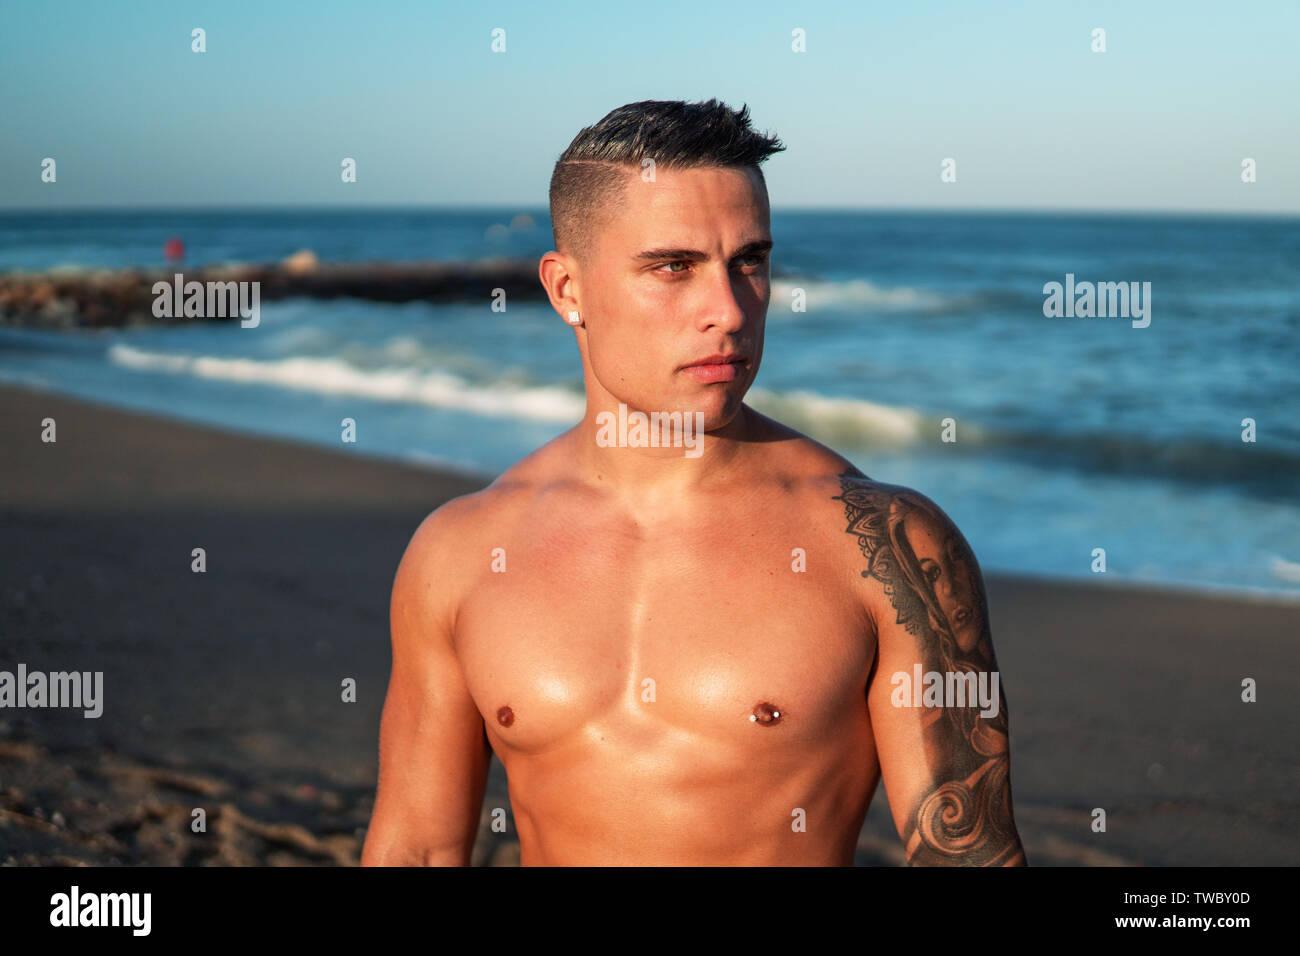 Tattooed bodybuilder sexy male coach at the beach. Stock Photo